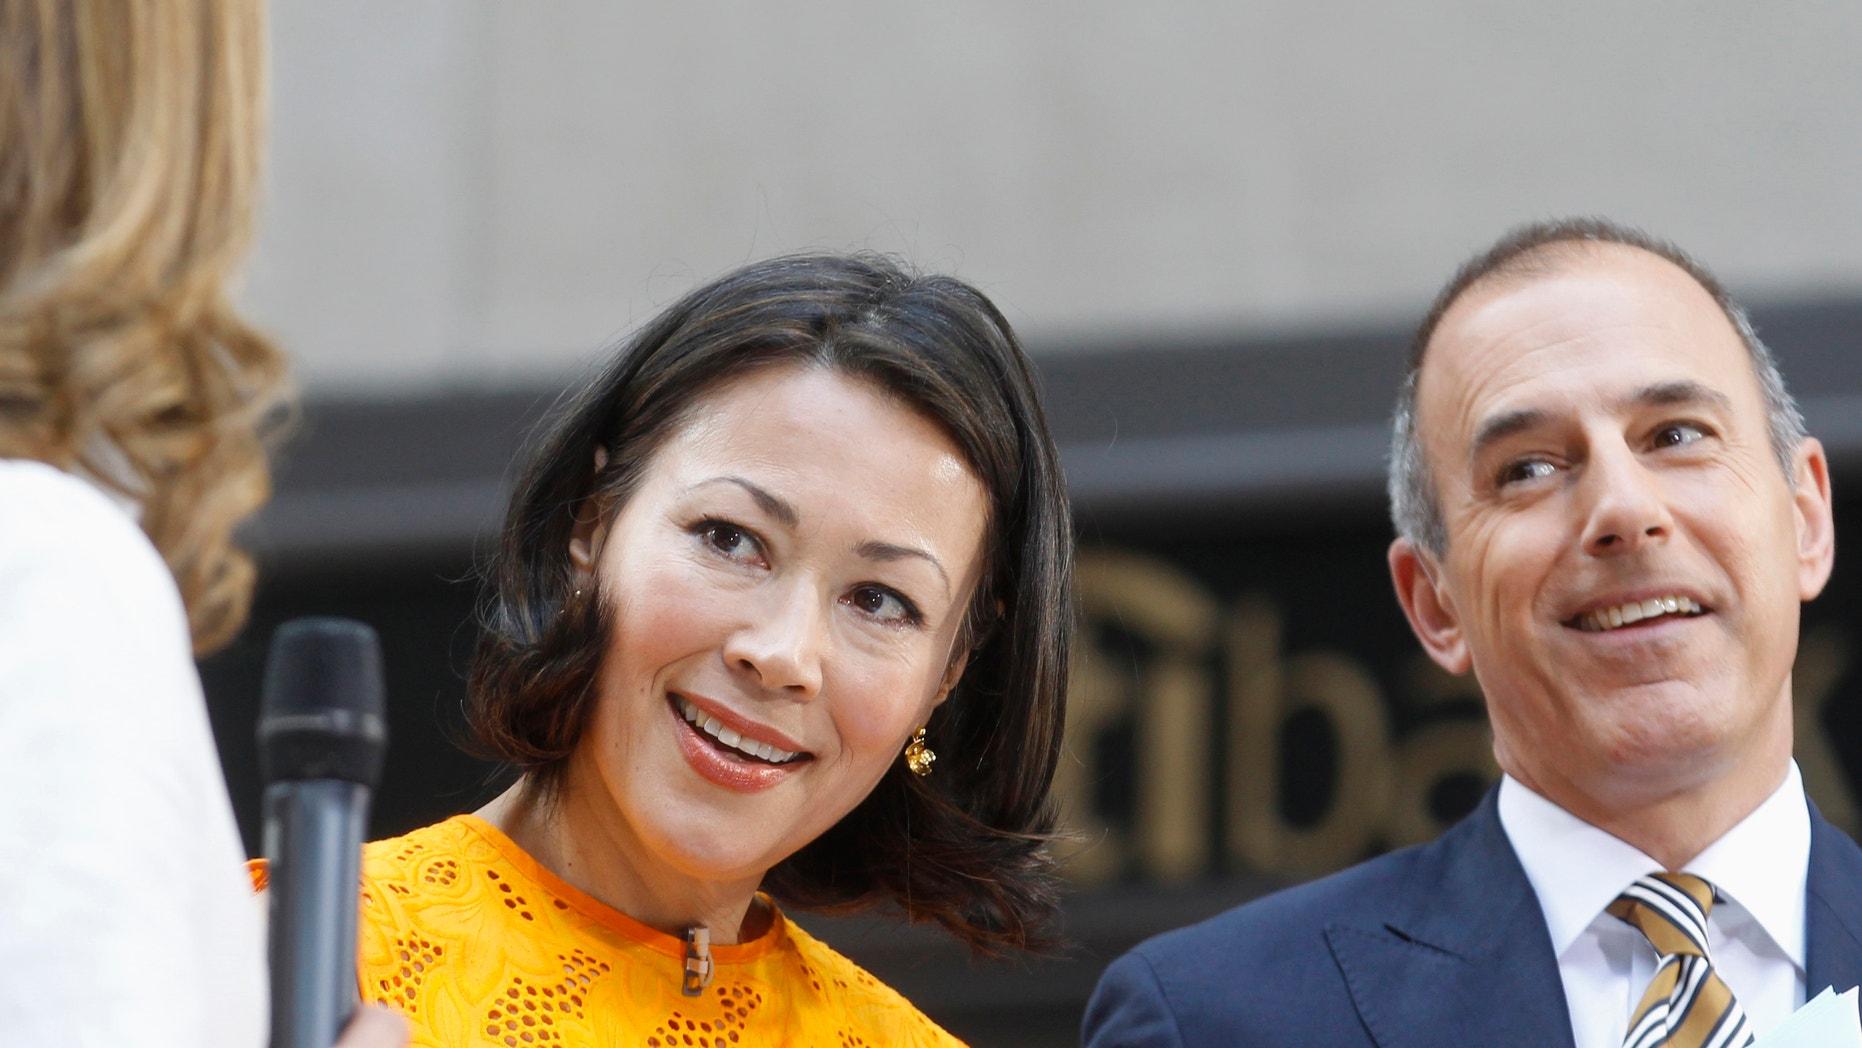 Ann Curry and Matt Lauer appear in New York June 22, 2012.